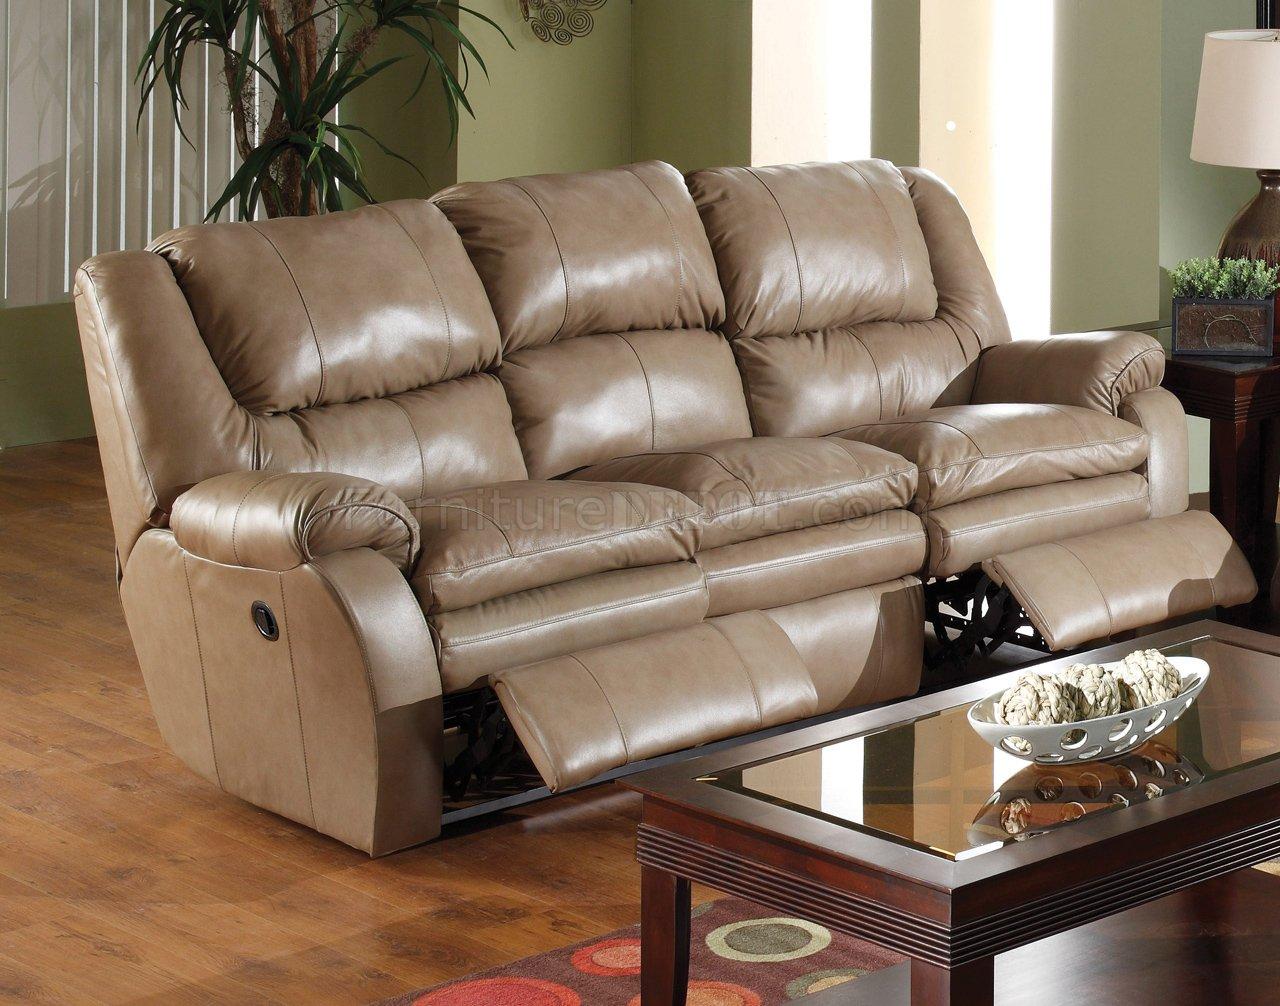 top grain leather sofa set environmentally friendly bed catnapper mushroom allegro reclining ...